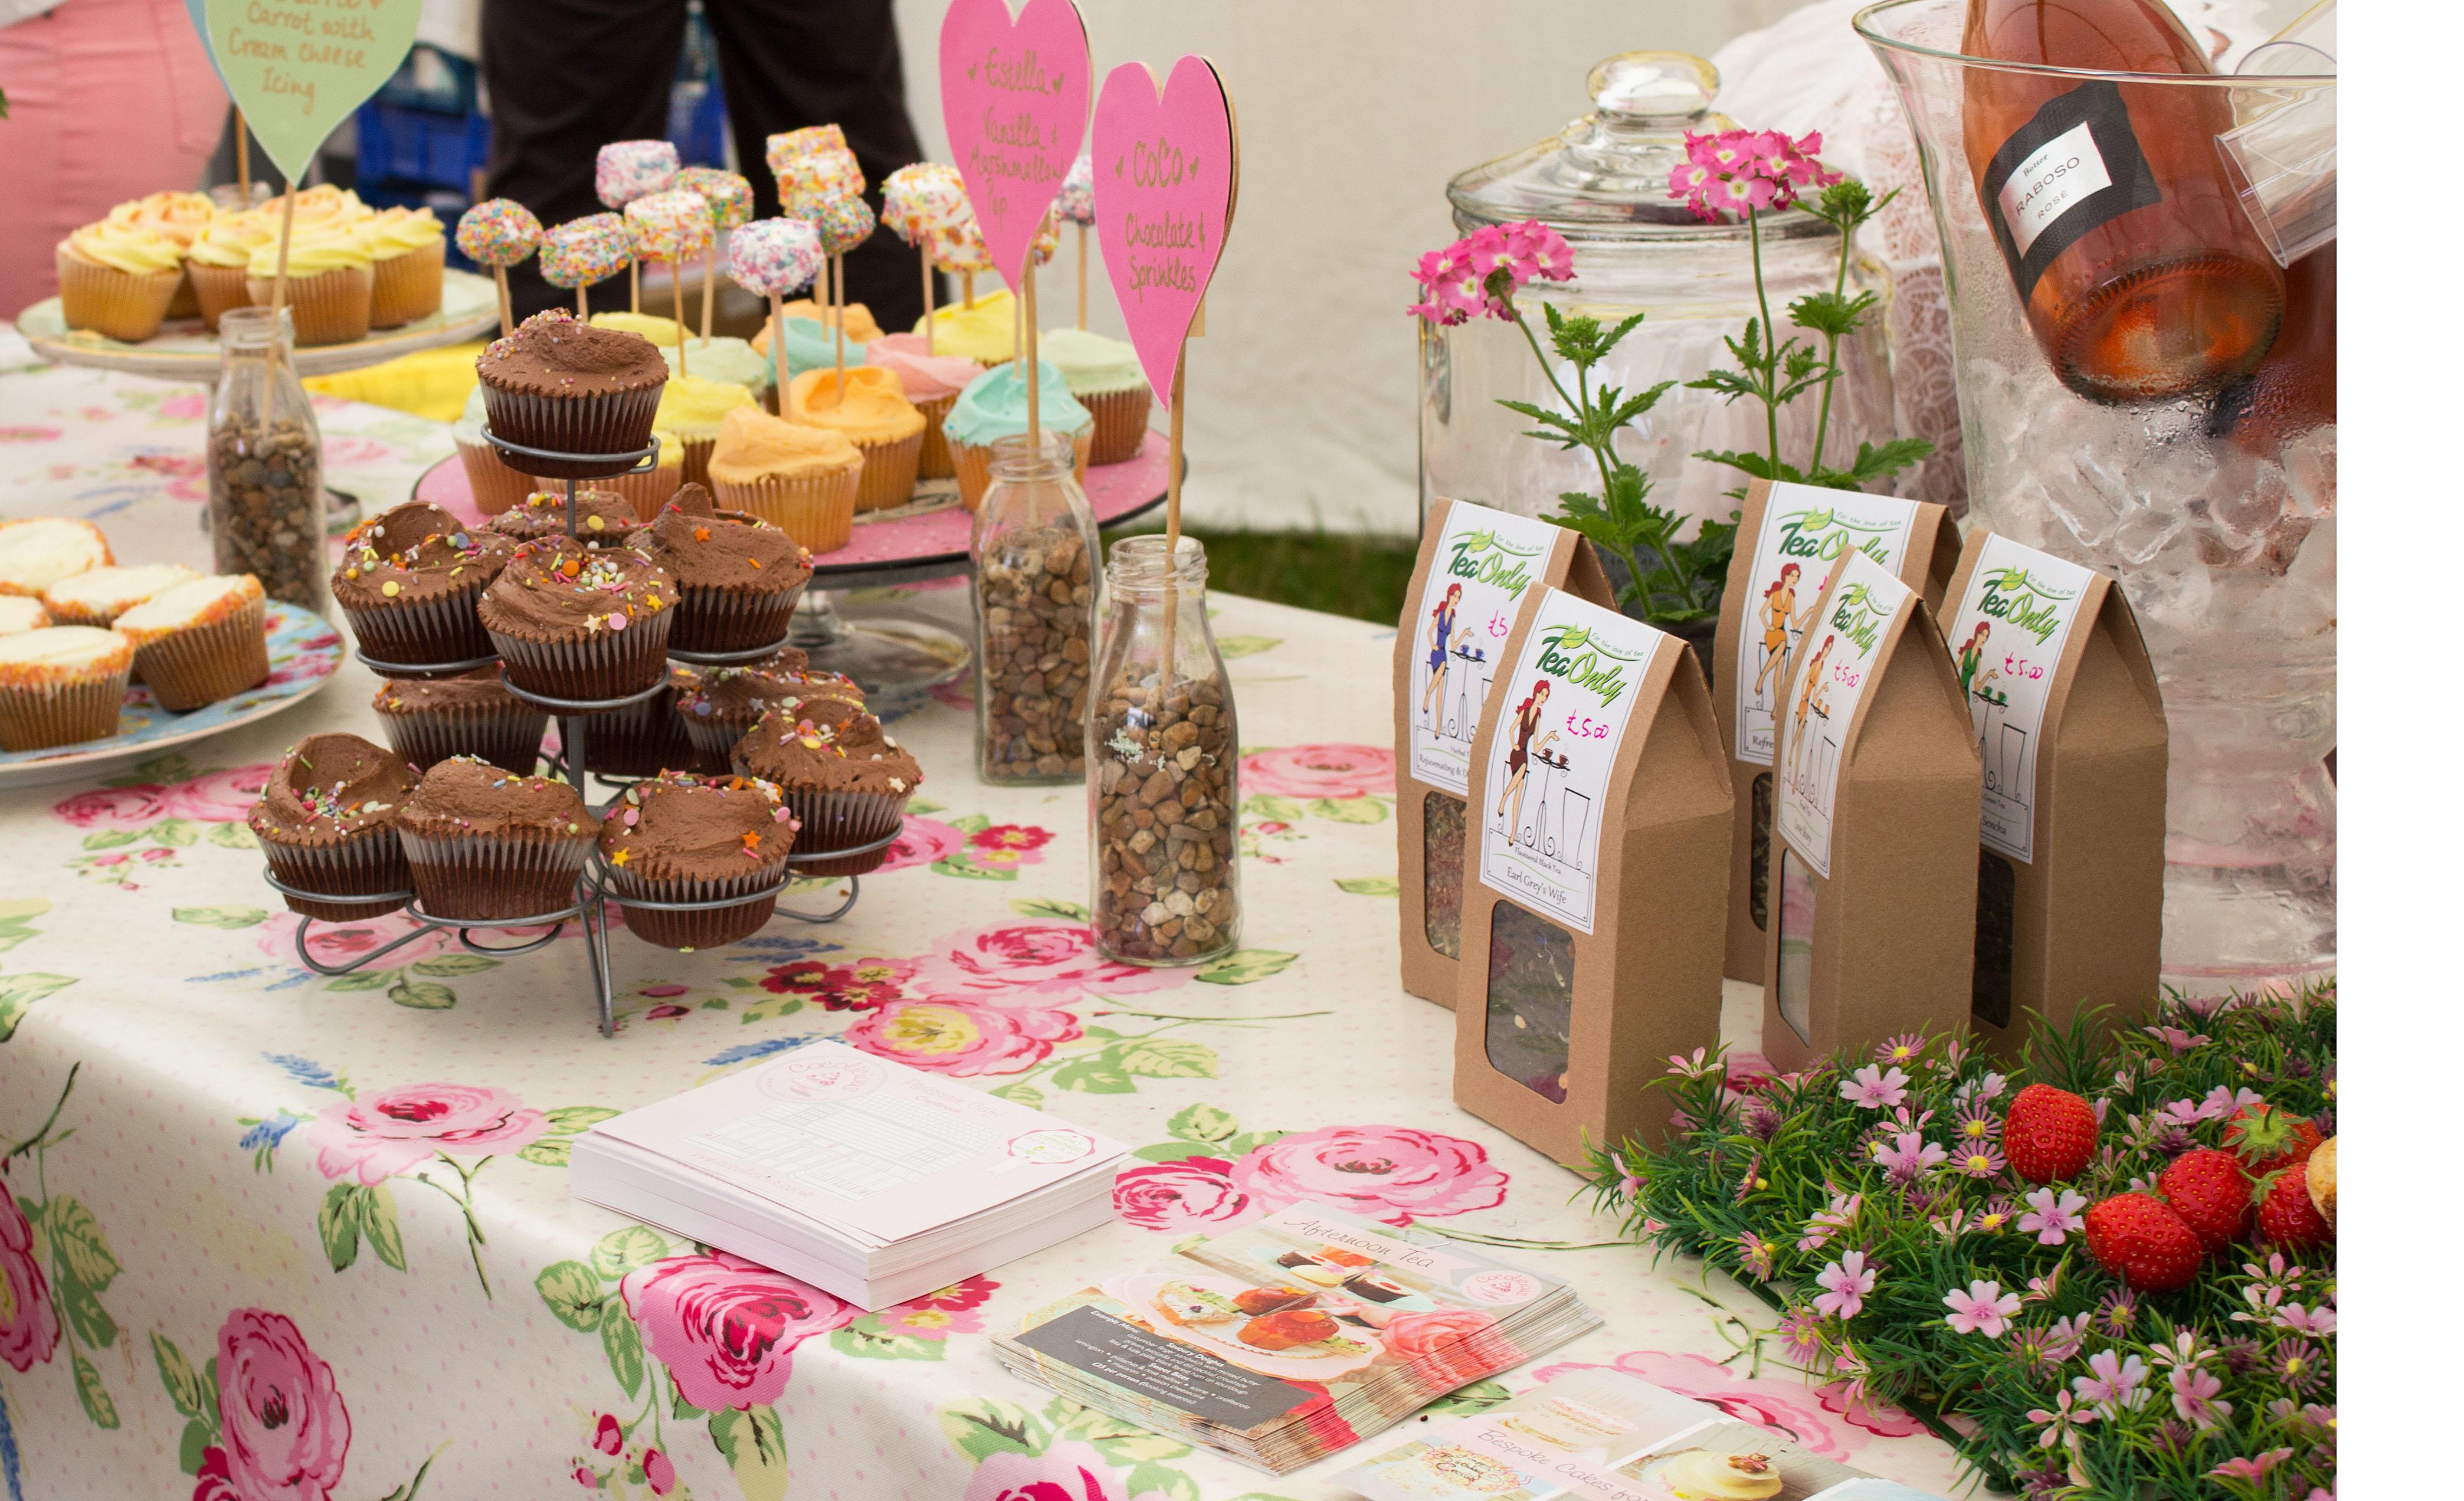 cocolicious cakes wt fair kent